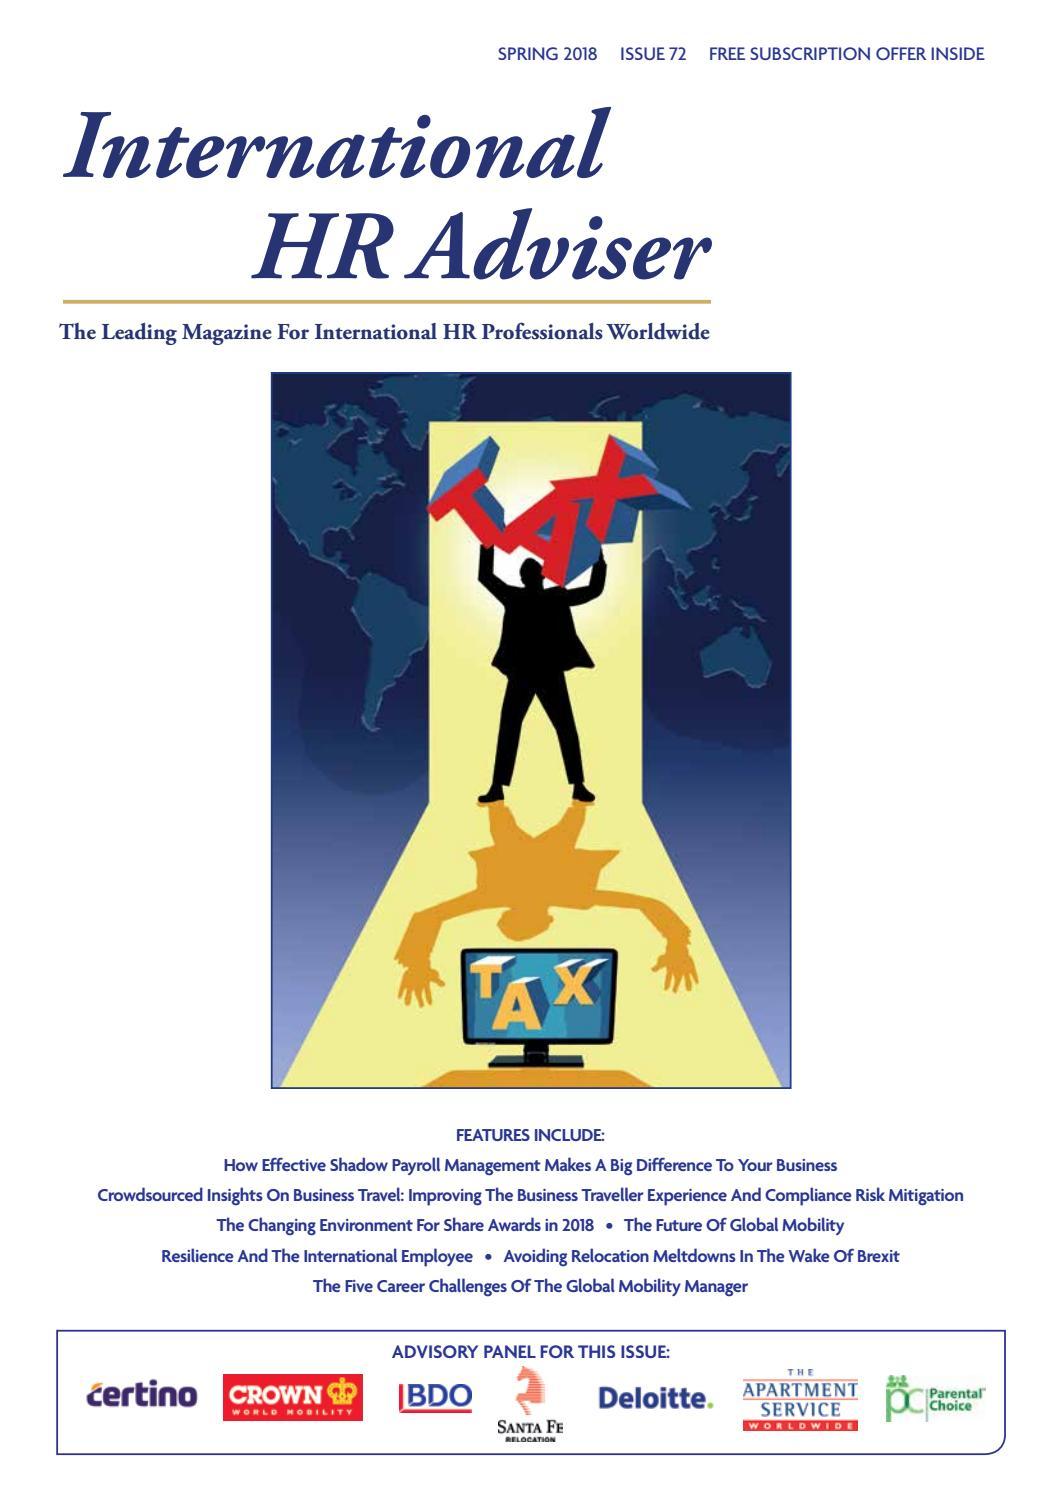 International HR Adviser Spring 2018 by International HR